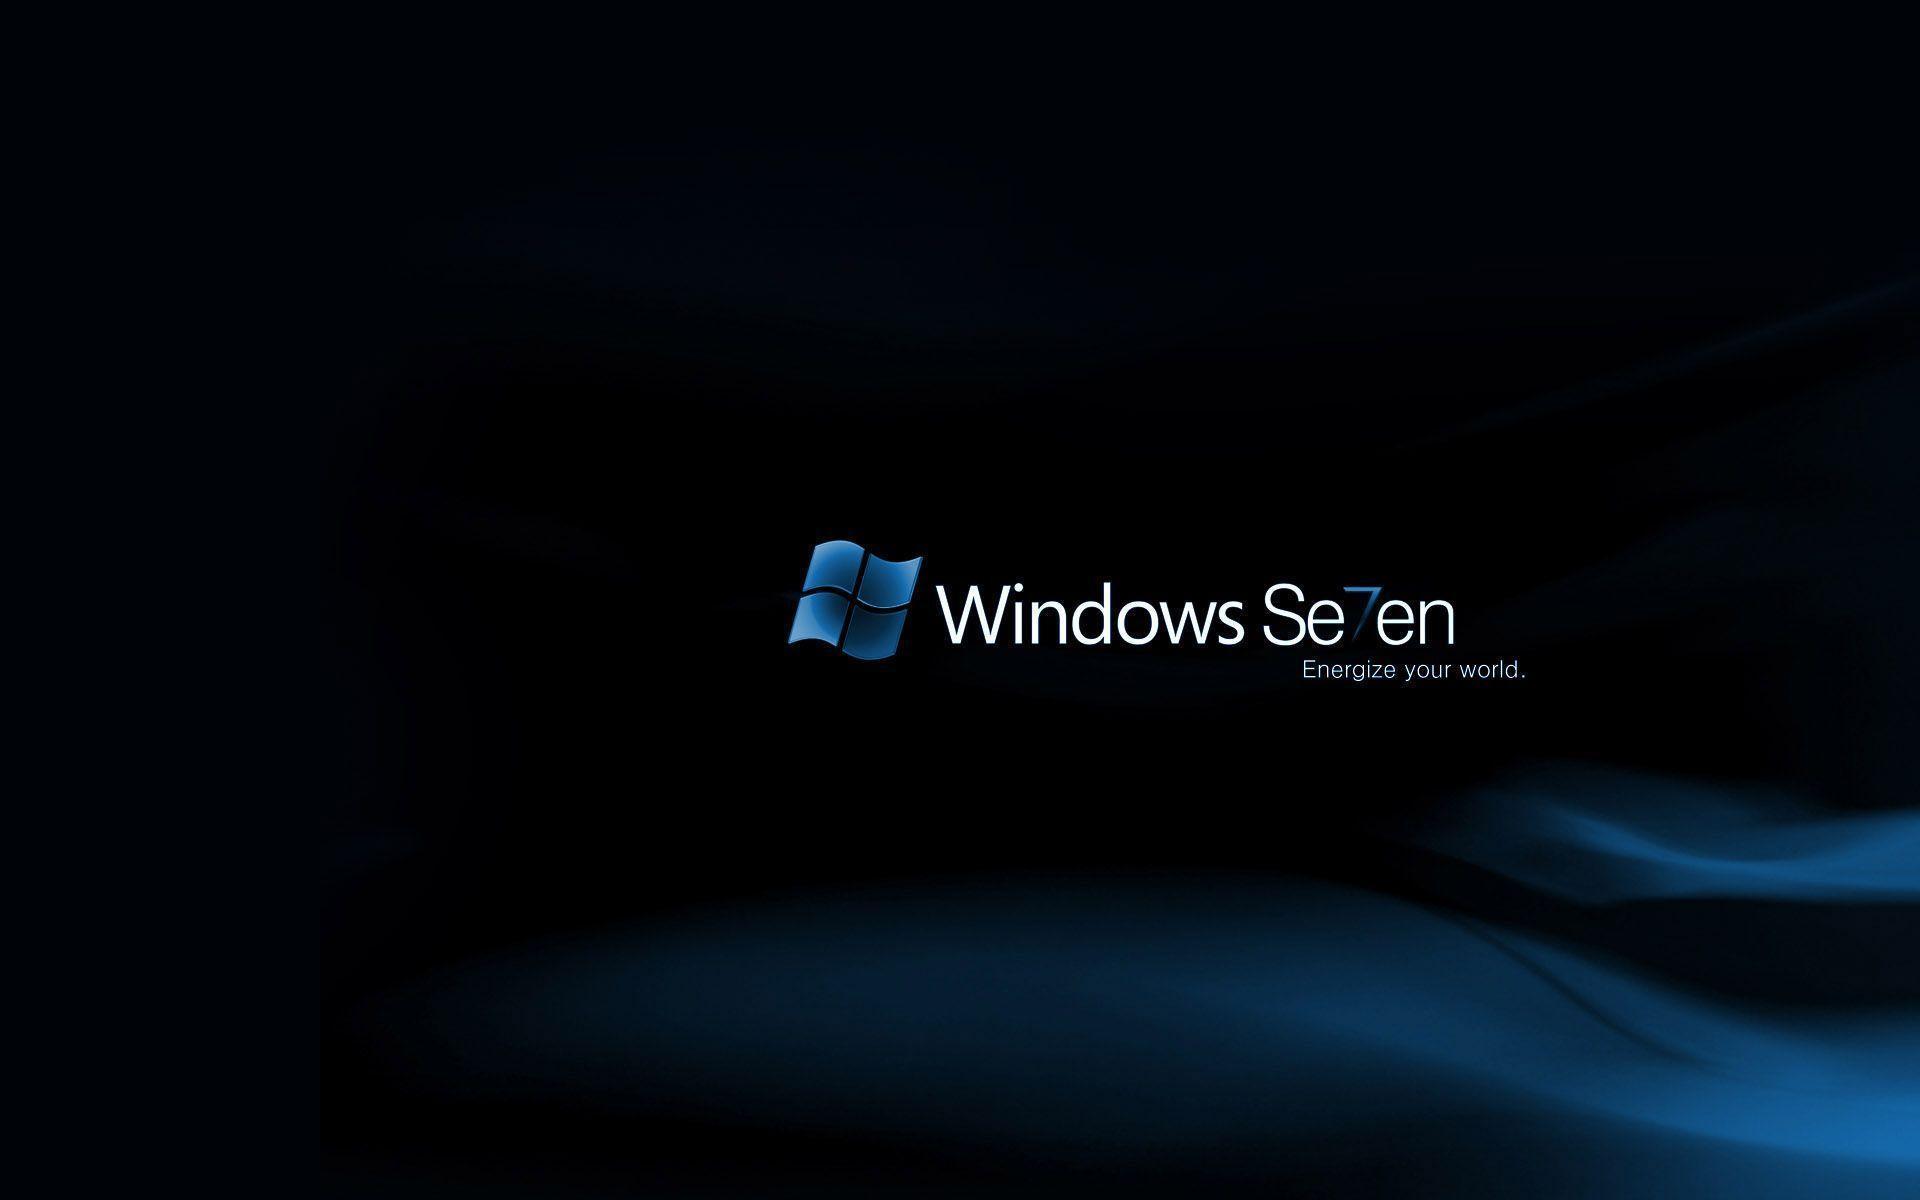 Hd Backgrounds For Windows 7 848J612 4254 Kb   Picseriocom 1920x1200